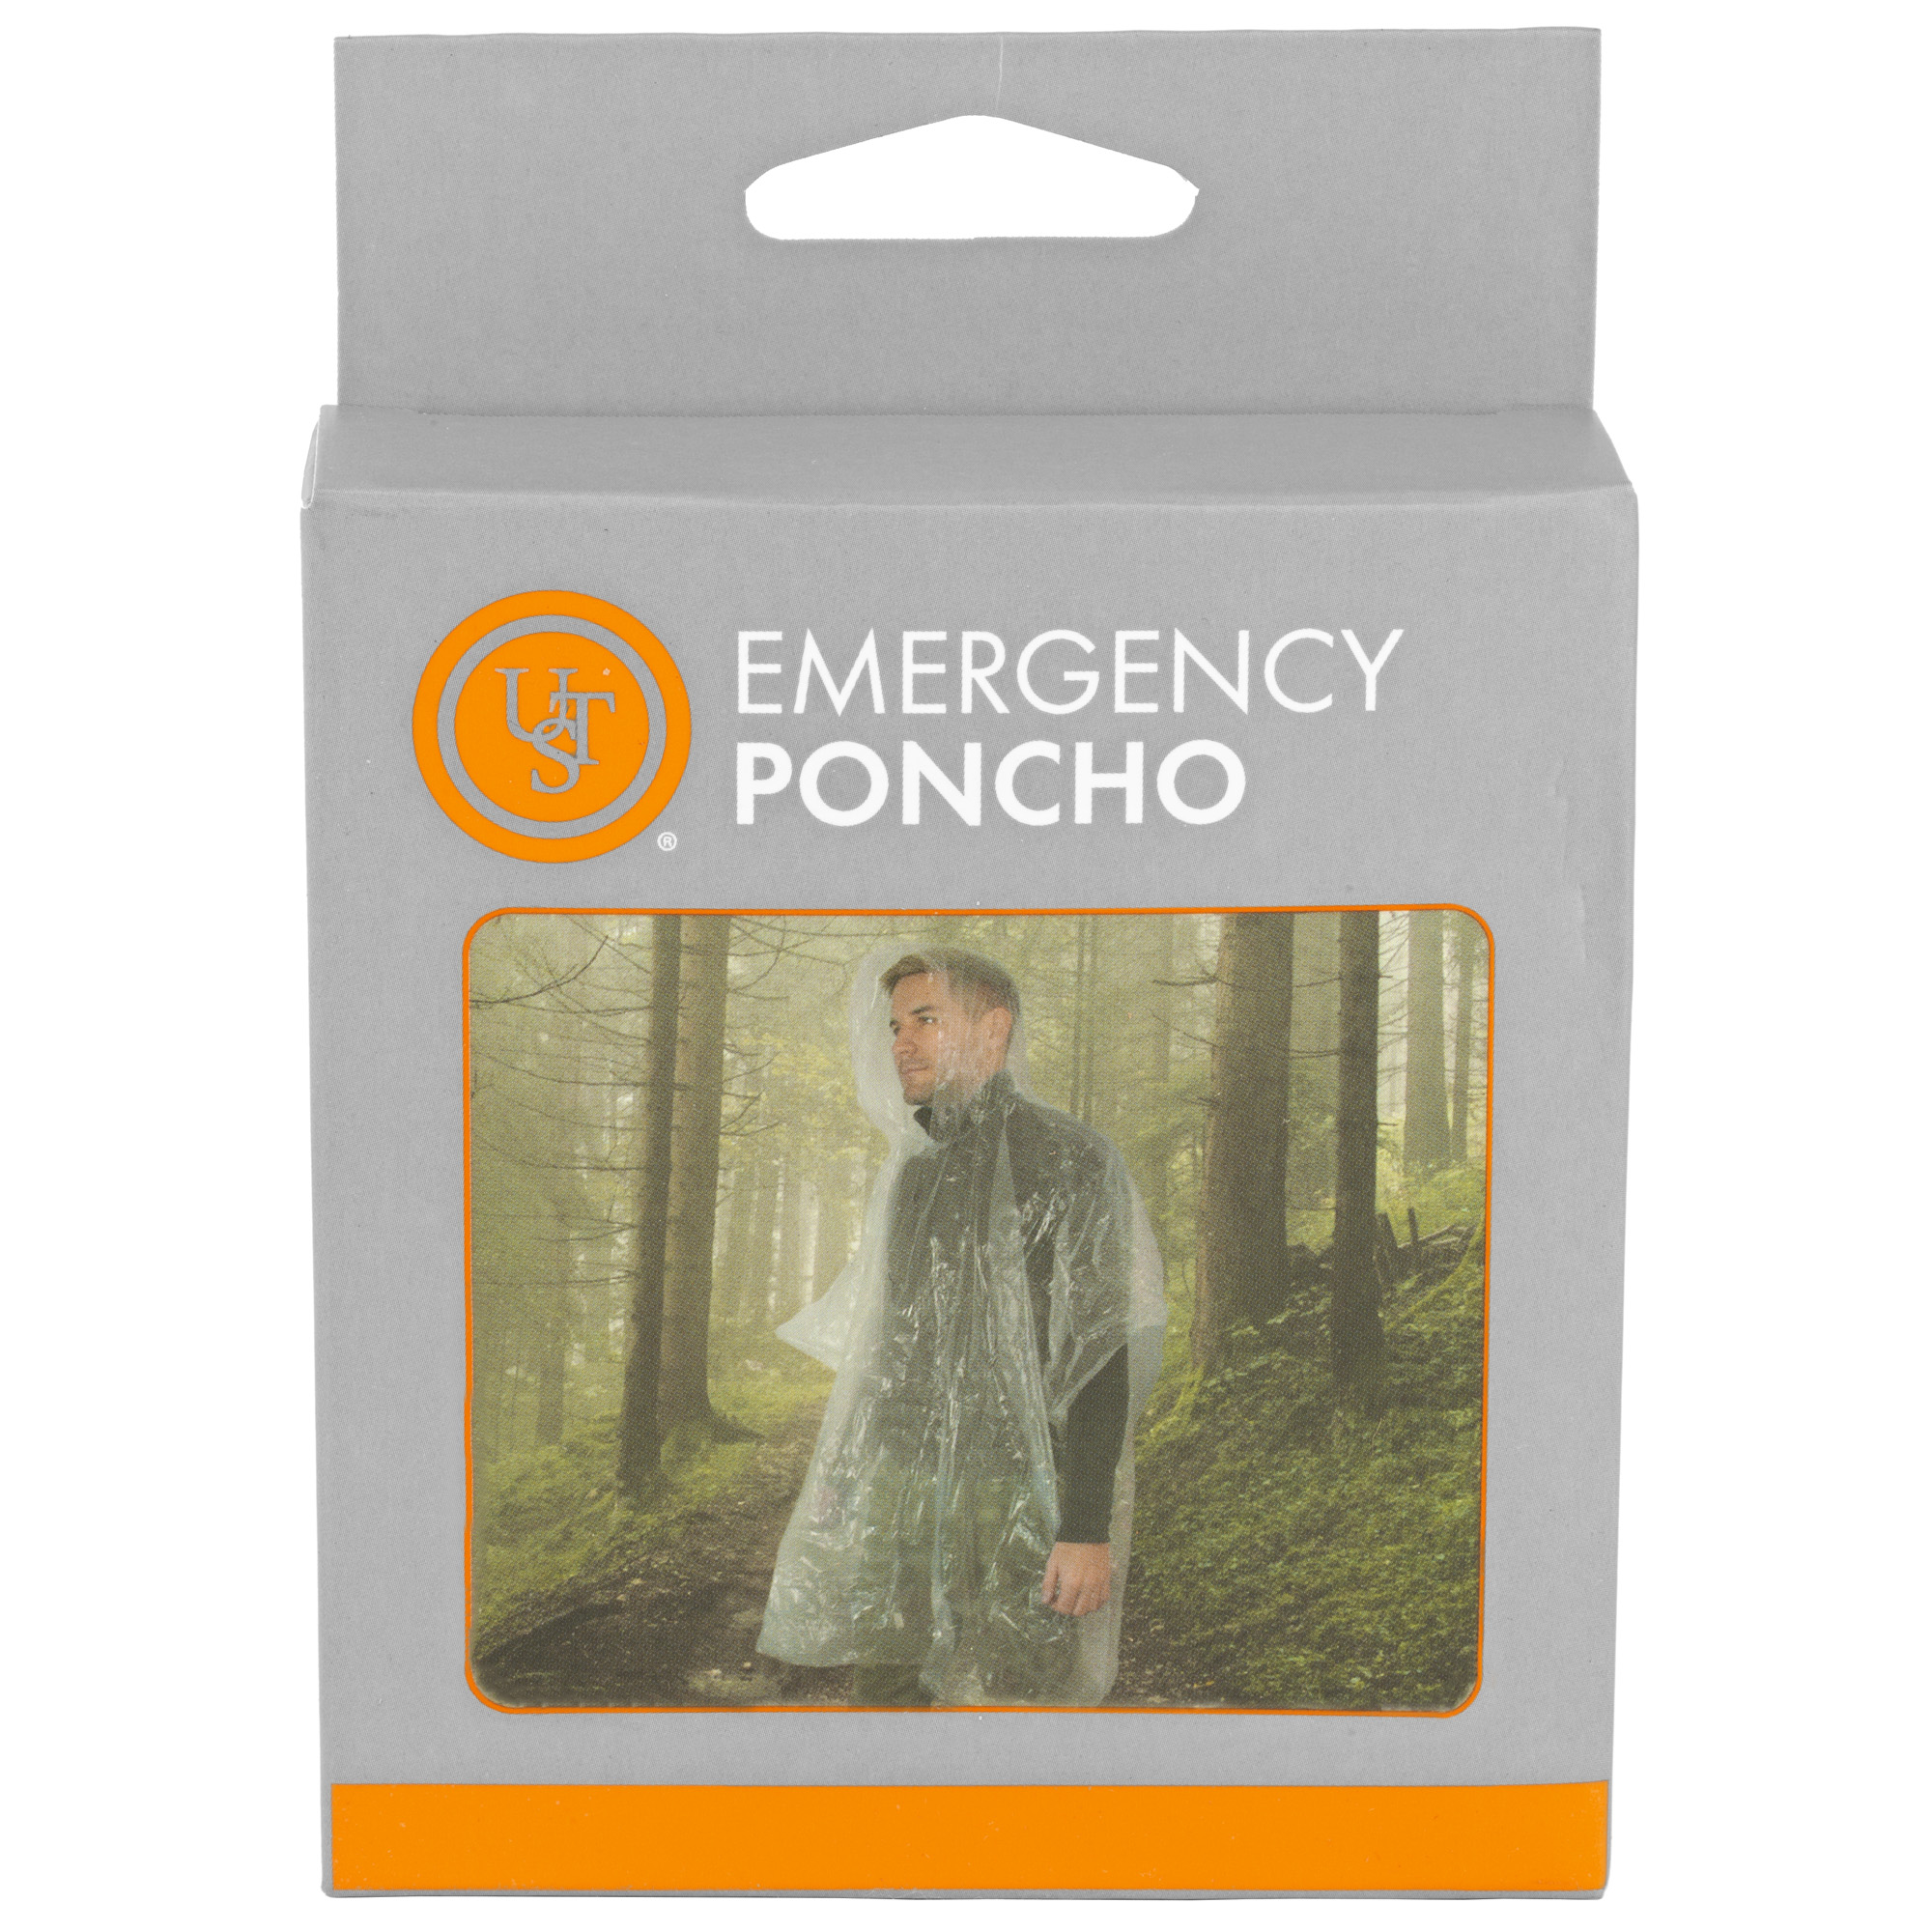 Ust Emergency Poncho Clear